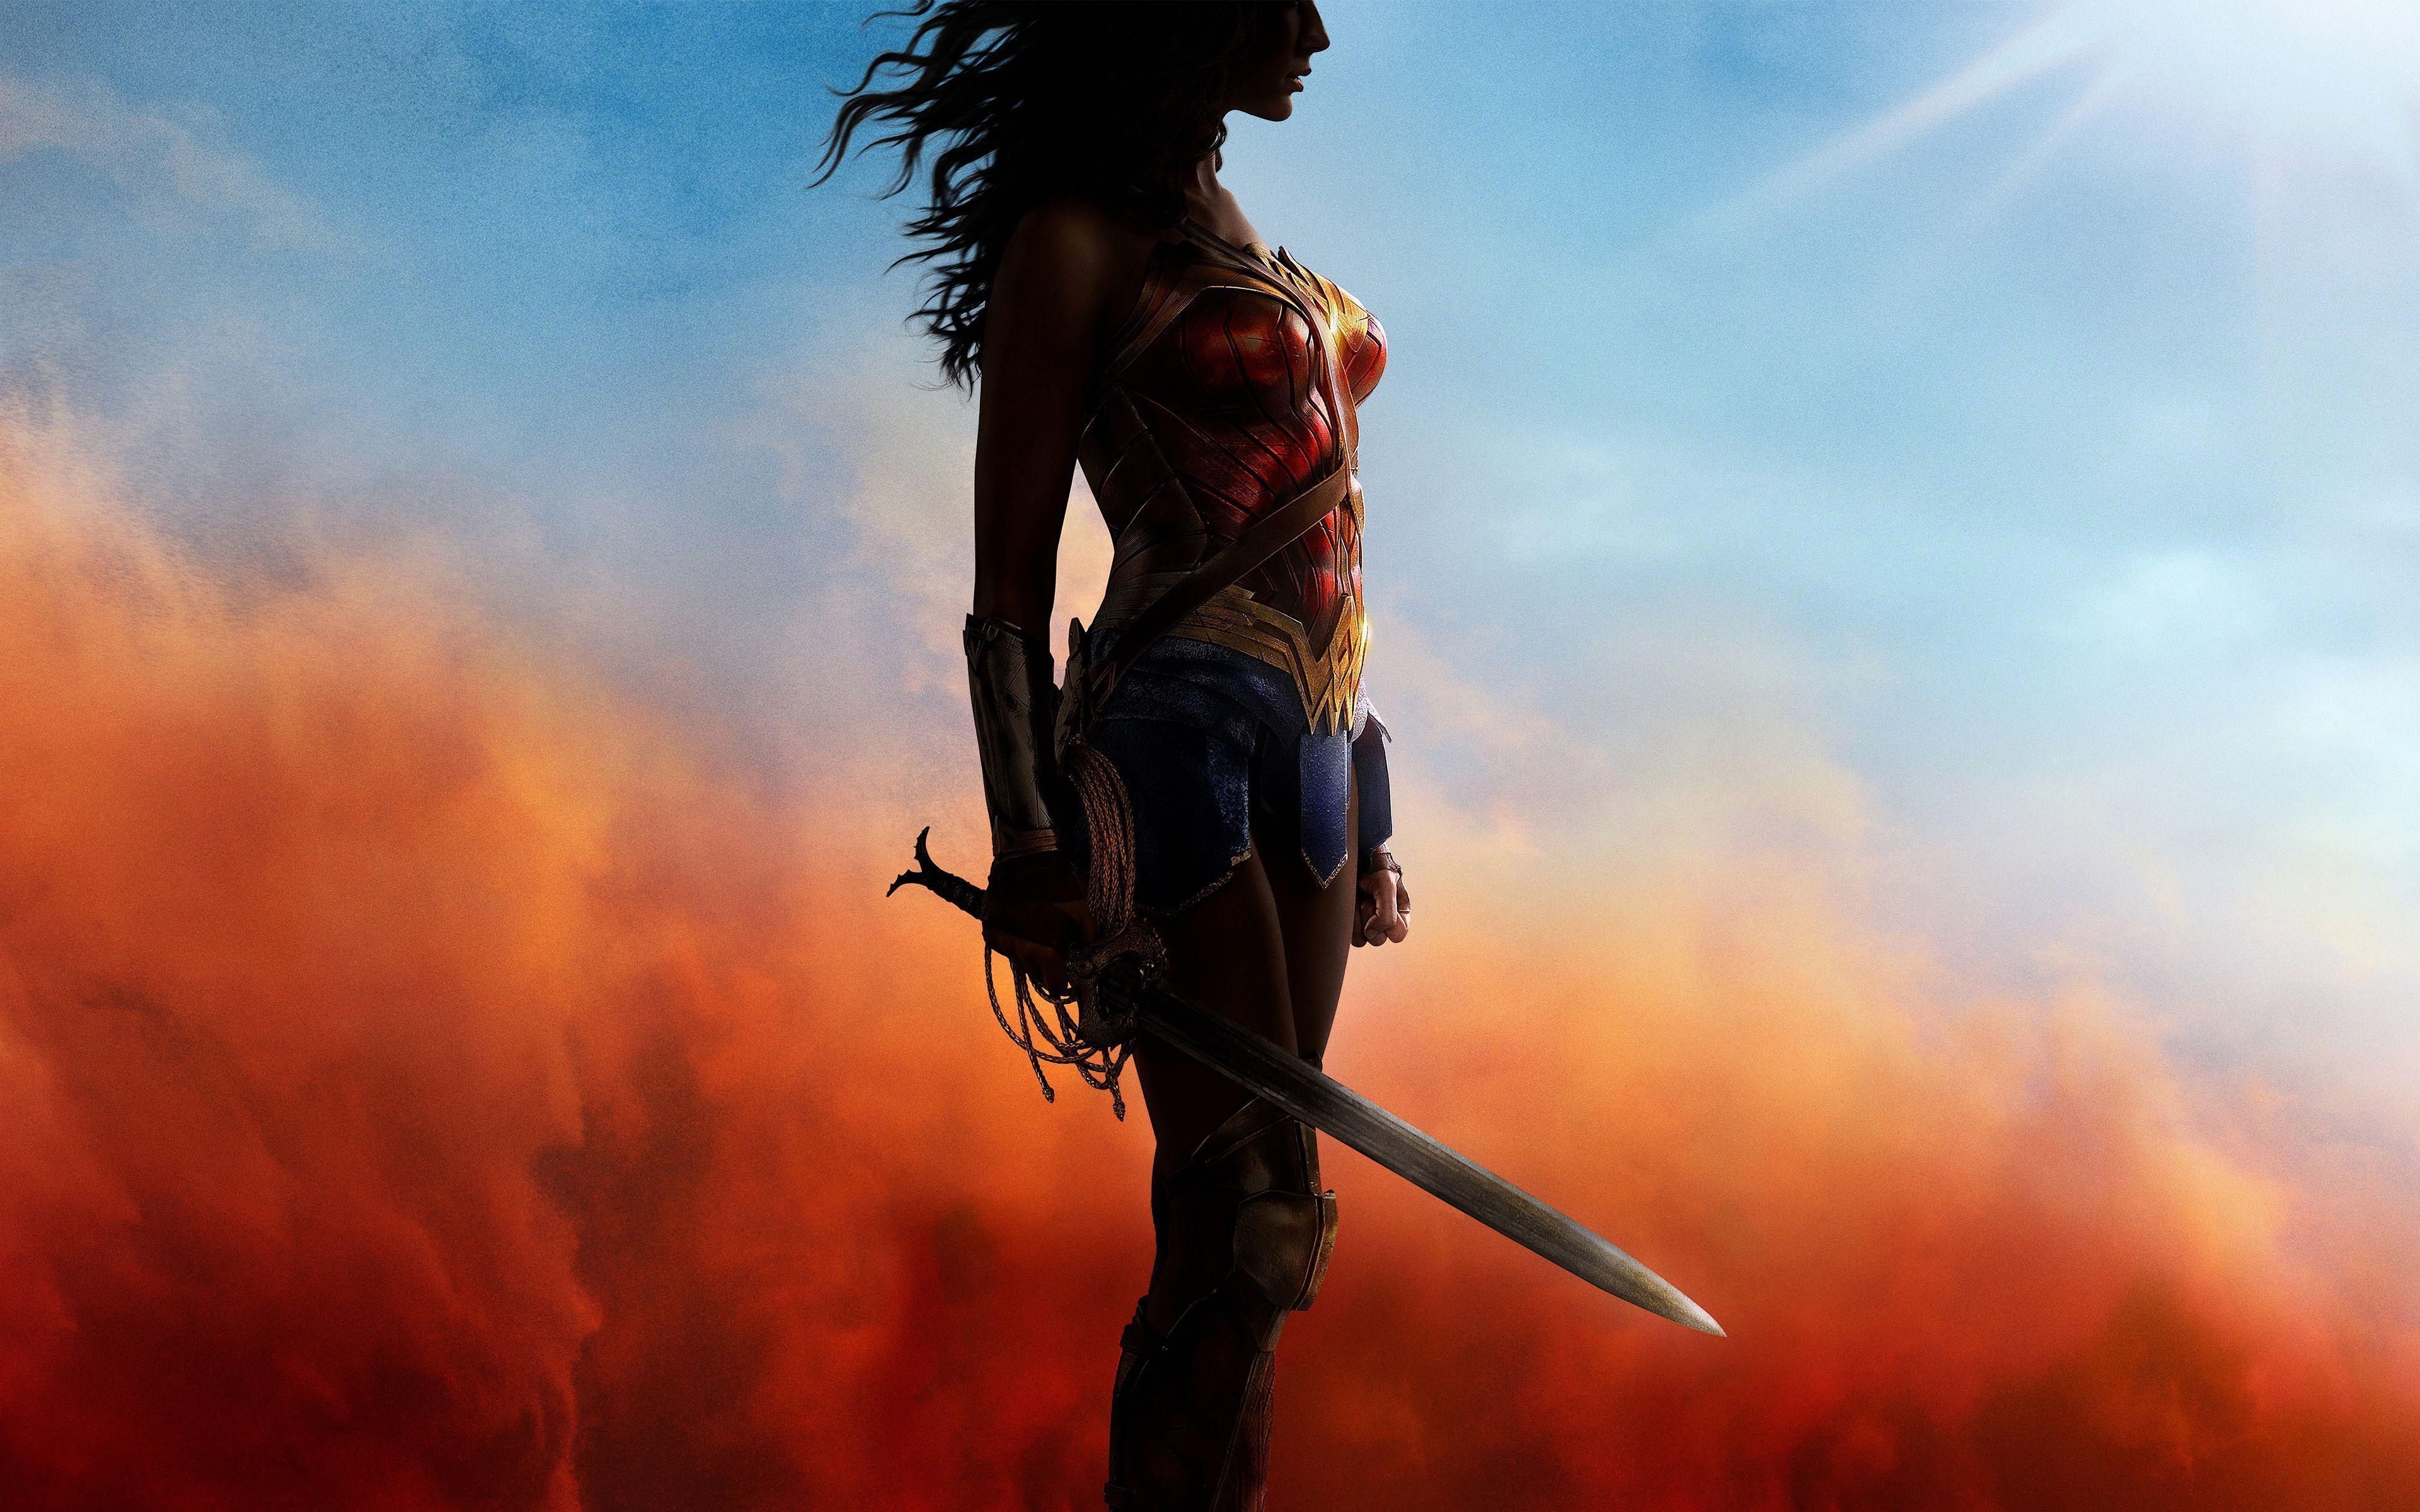 2017 Wonder Woman Wallpapers | HD Wallpapers